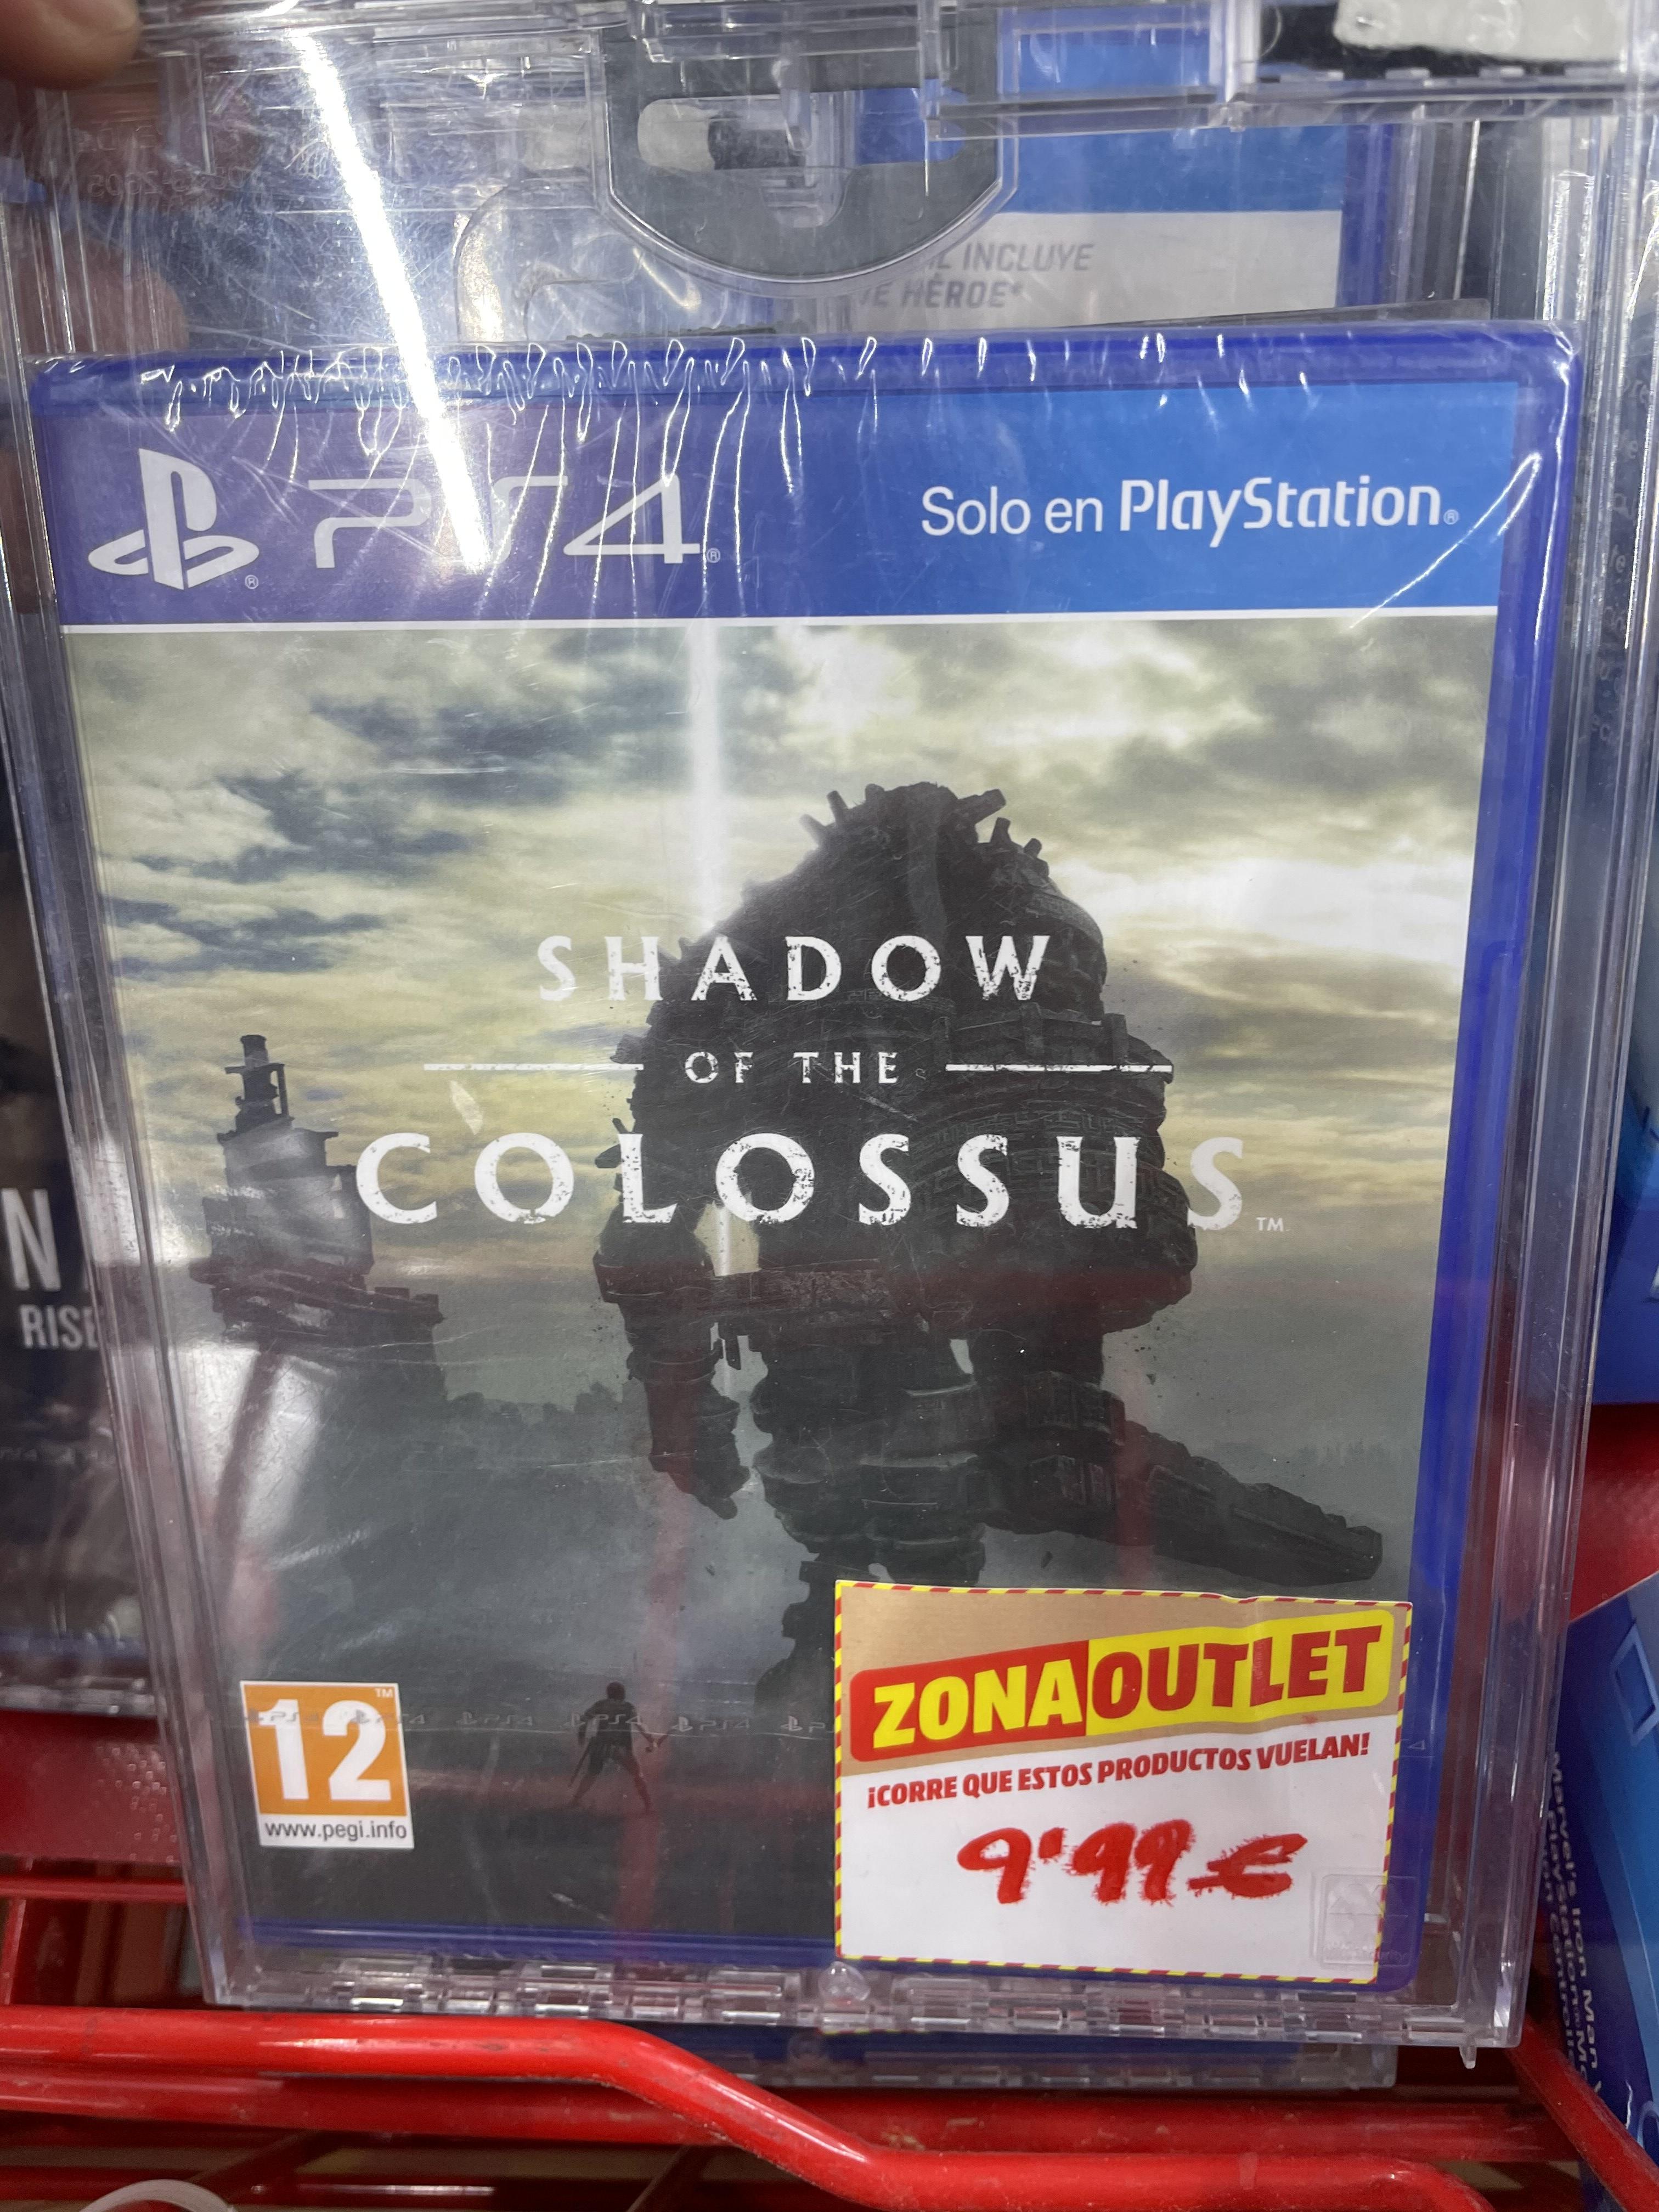 PS4 Shadow of the Colossus Mediamarkt de Goya en Madrid